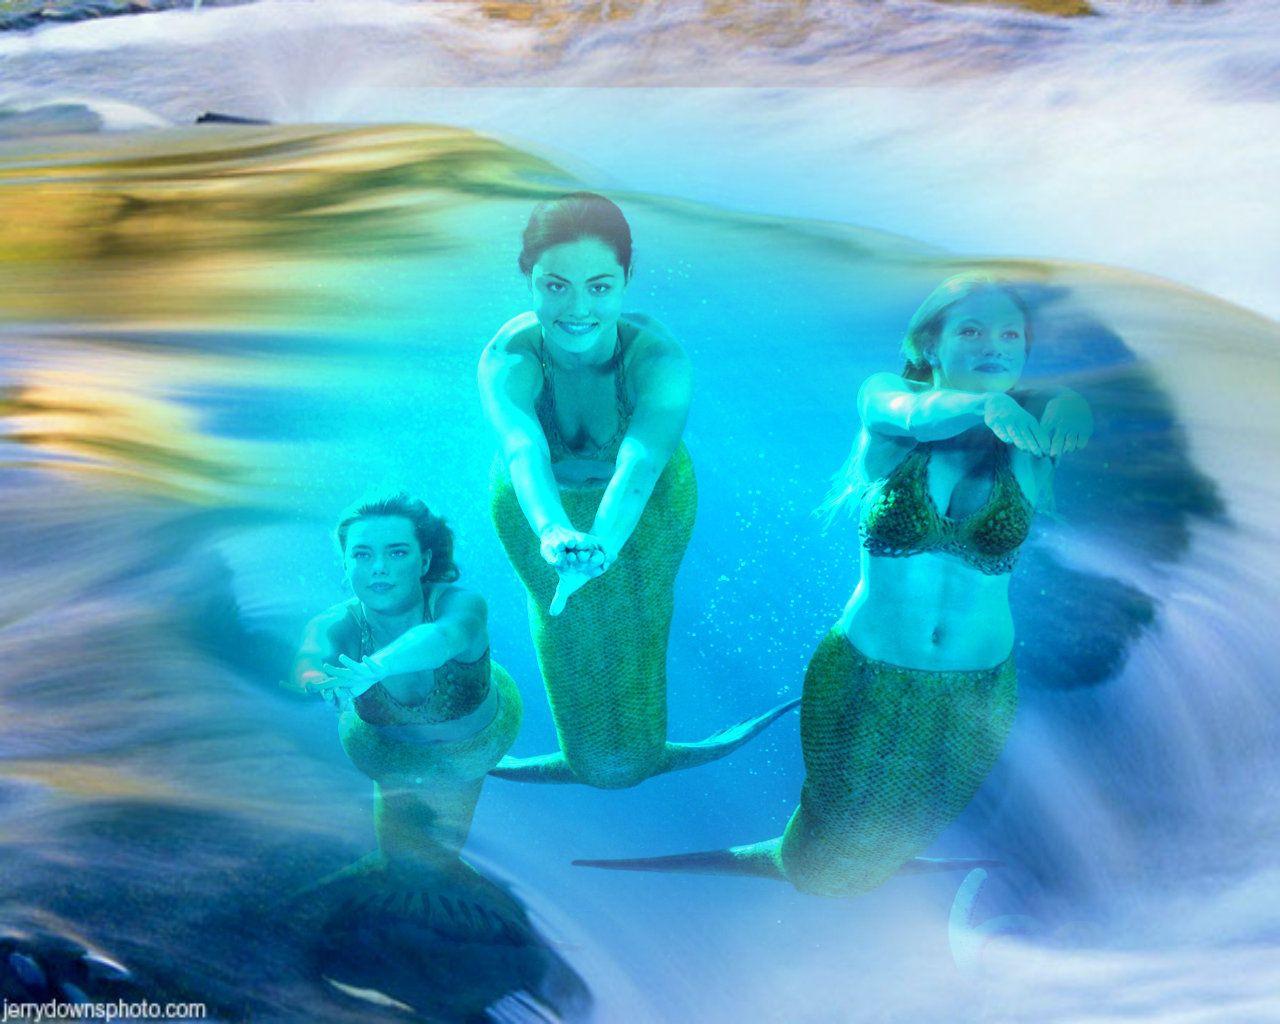 H2o Plötzlich Meerjungfrau Ausmalbilder Einzigartig New H2o Wallpapers Wallpaper Cave Das Bild